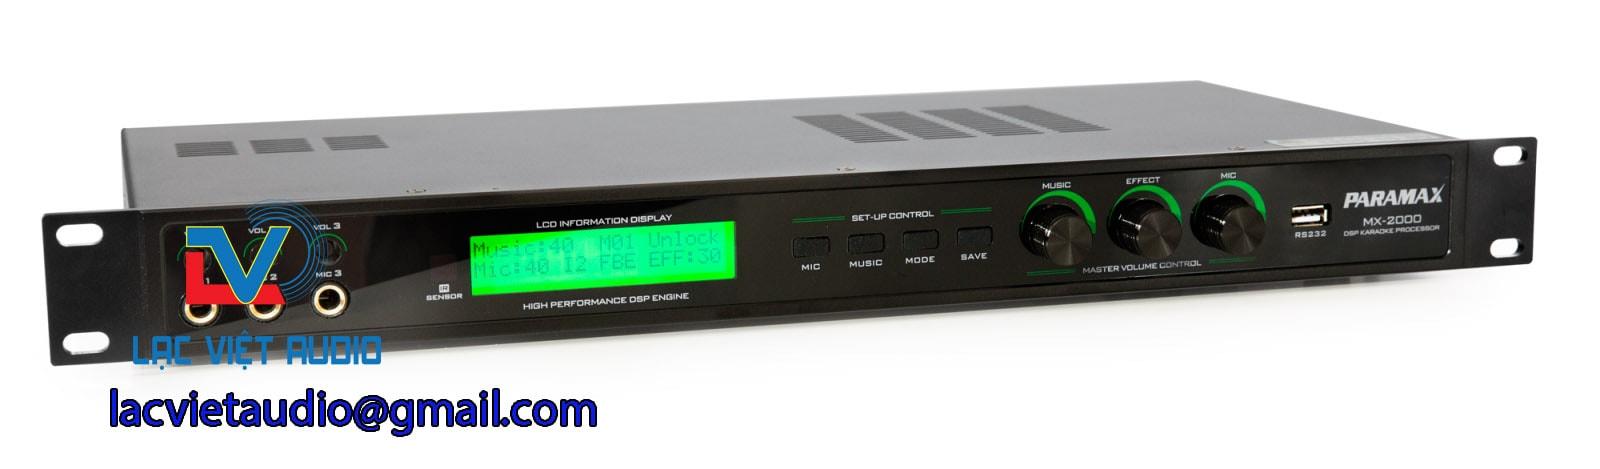 Vang số karaoke paramax MX-2000